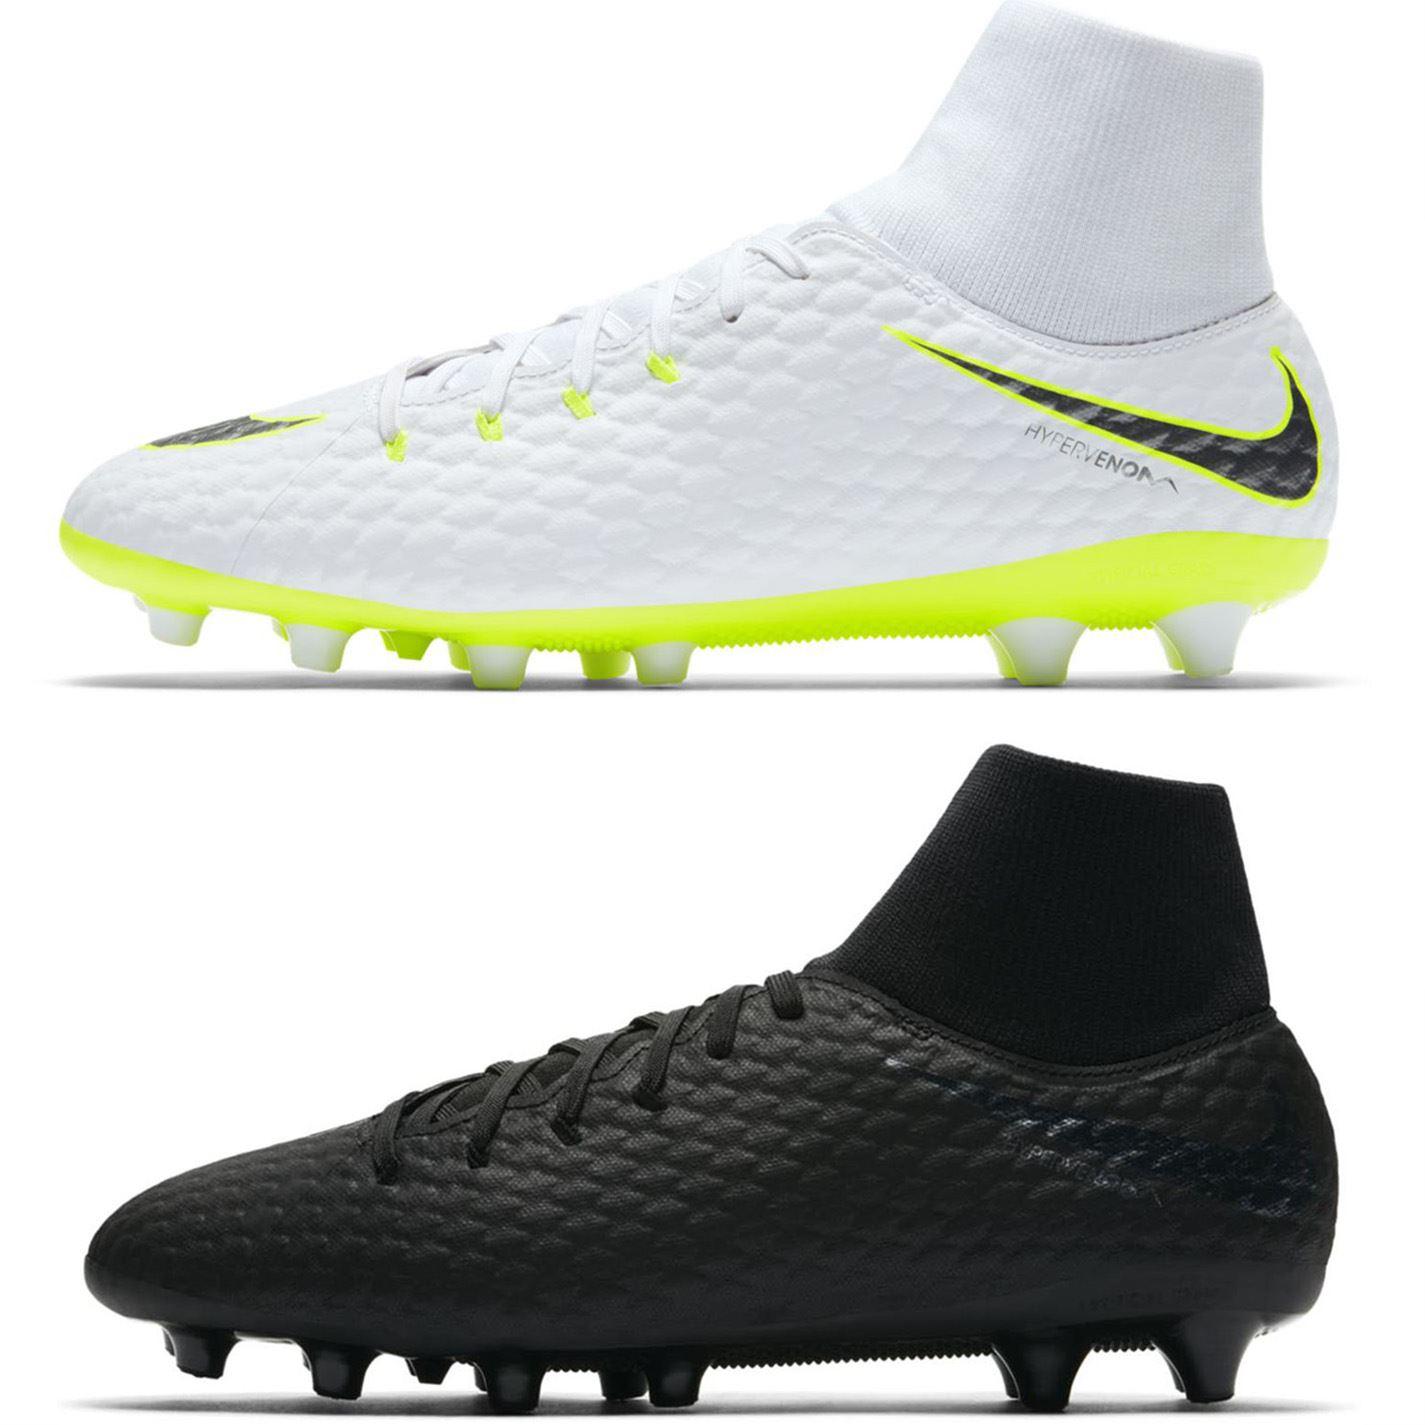 cienie bliżej na kup popularne Details about Nike Hypervenom Phantom 3 Academy DF AG Football Boots Mens  Soccer Shoes Cleats